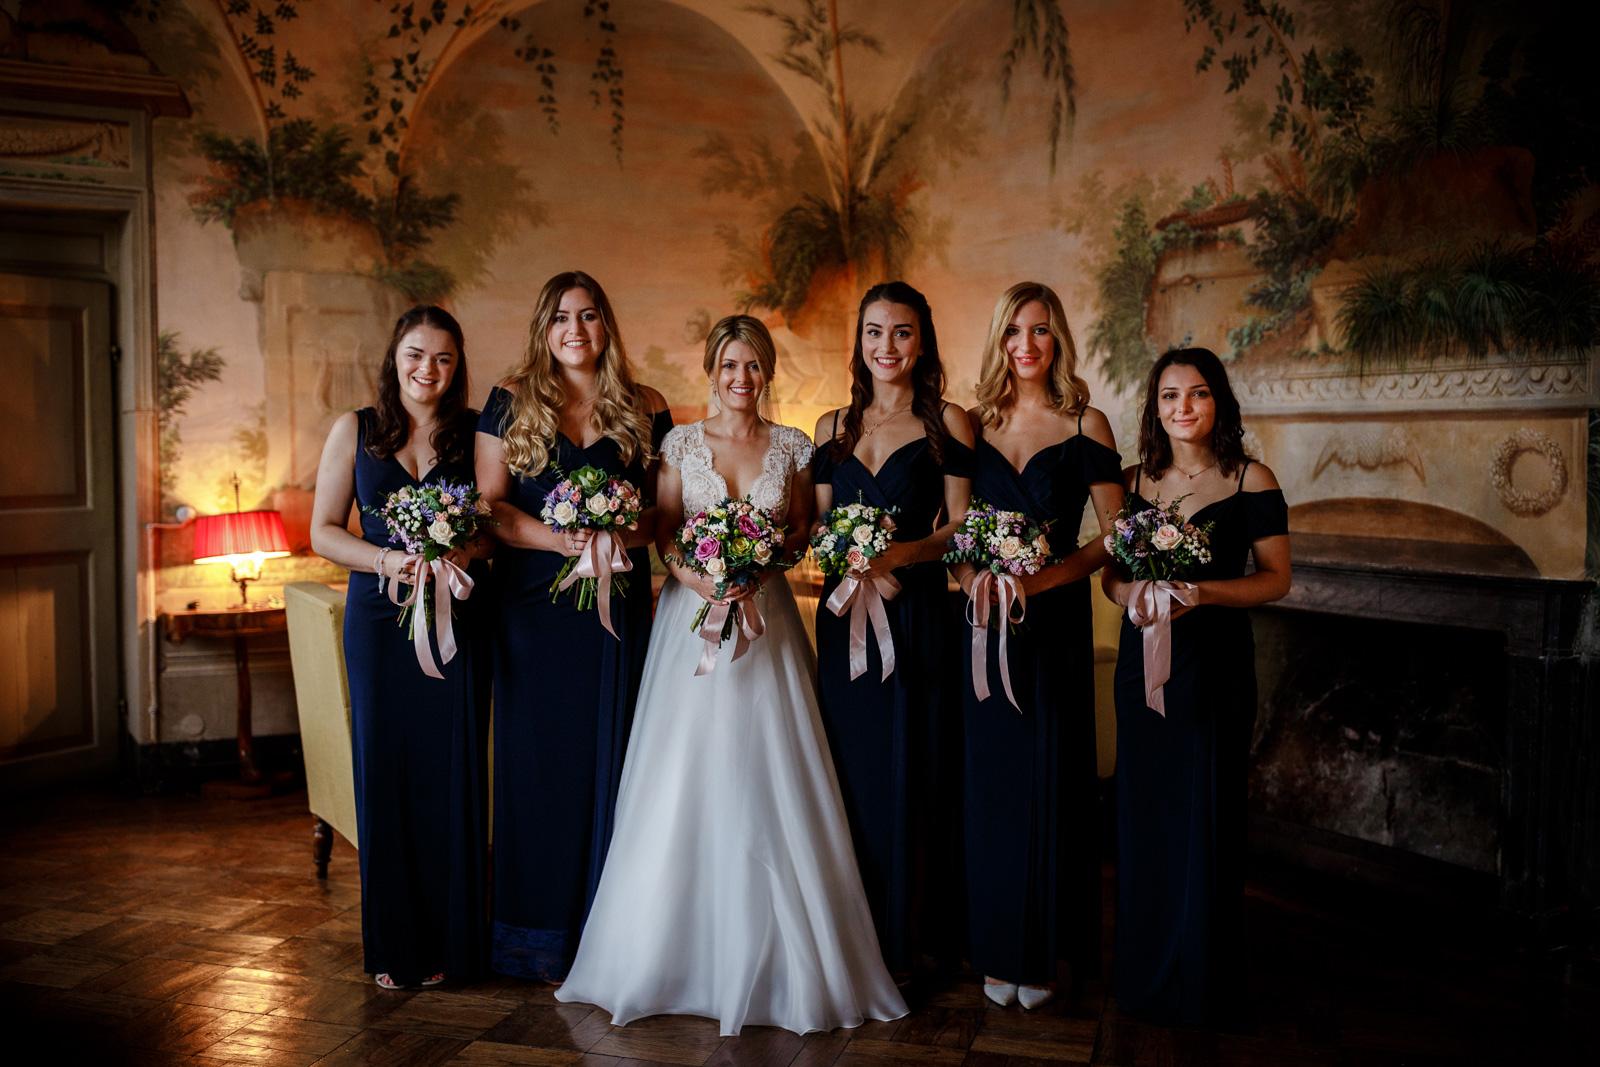 The bridal party at Villa Catignano in Siena